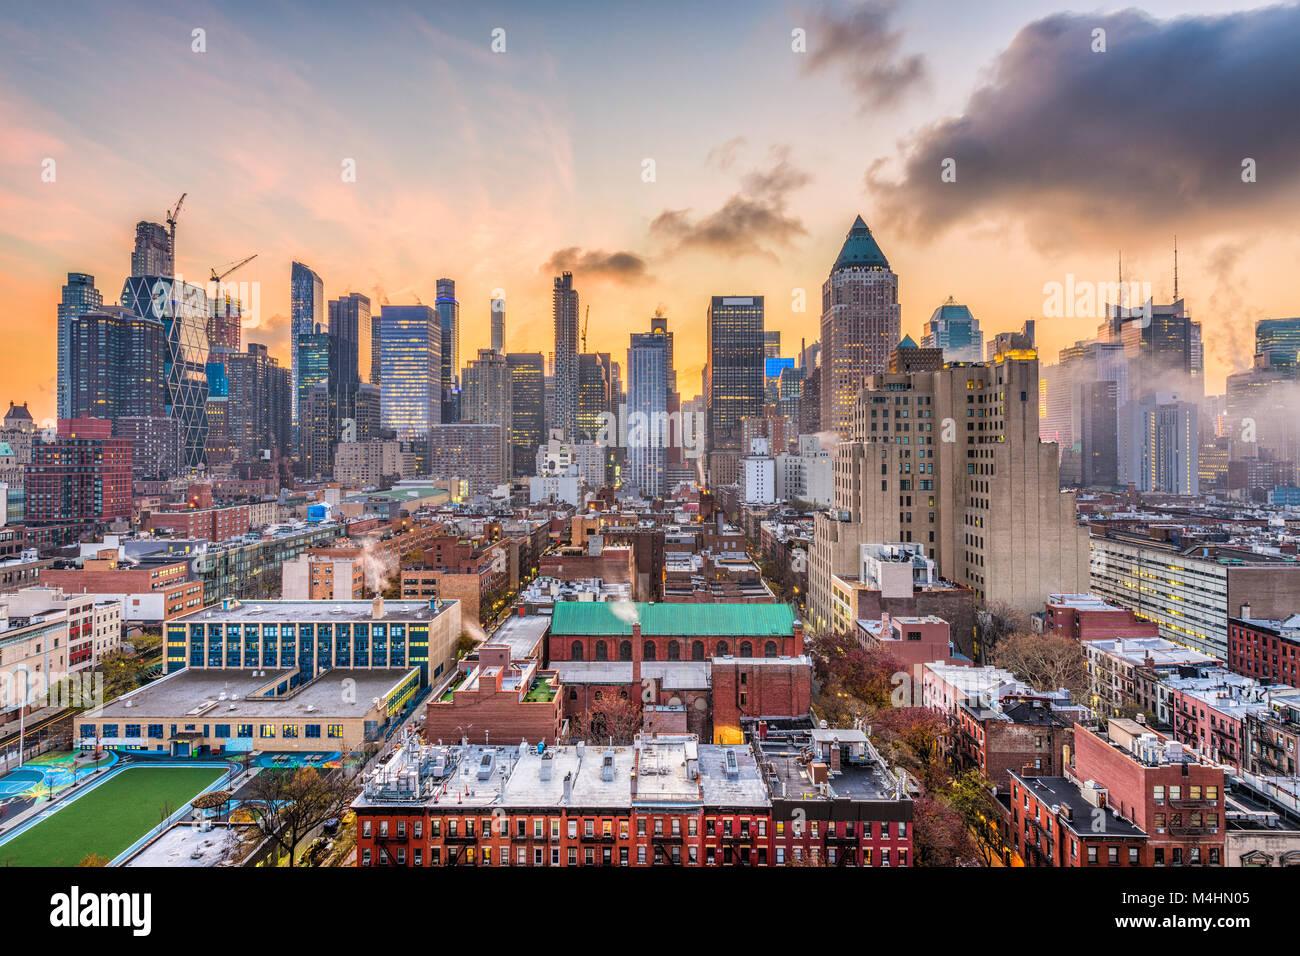 New York, New York, USA midtown Manhattan skyline over Hell's Kitchen at dawn. Stock Photo